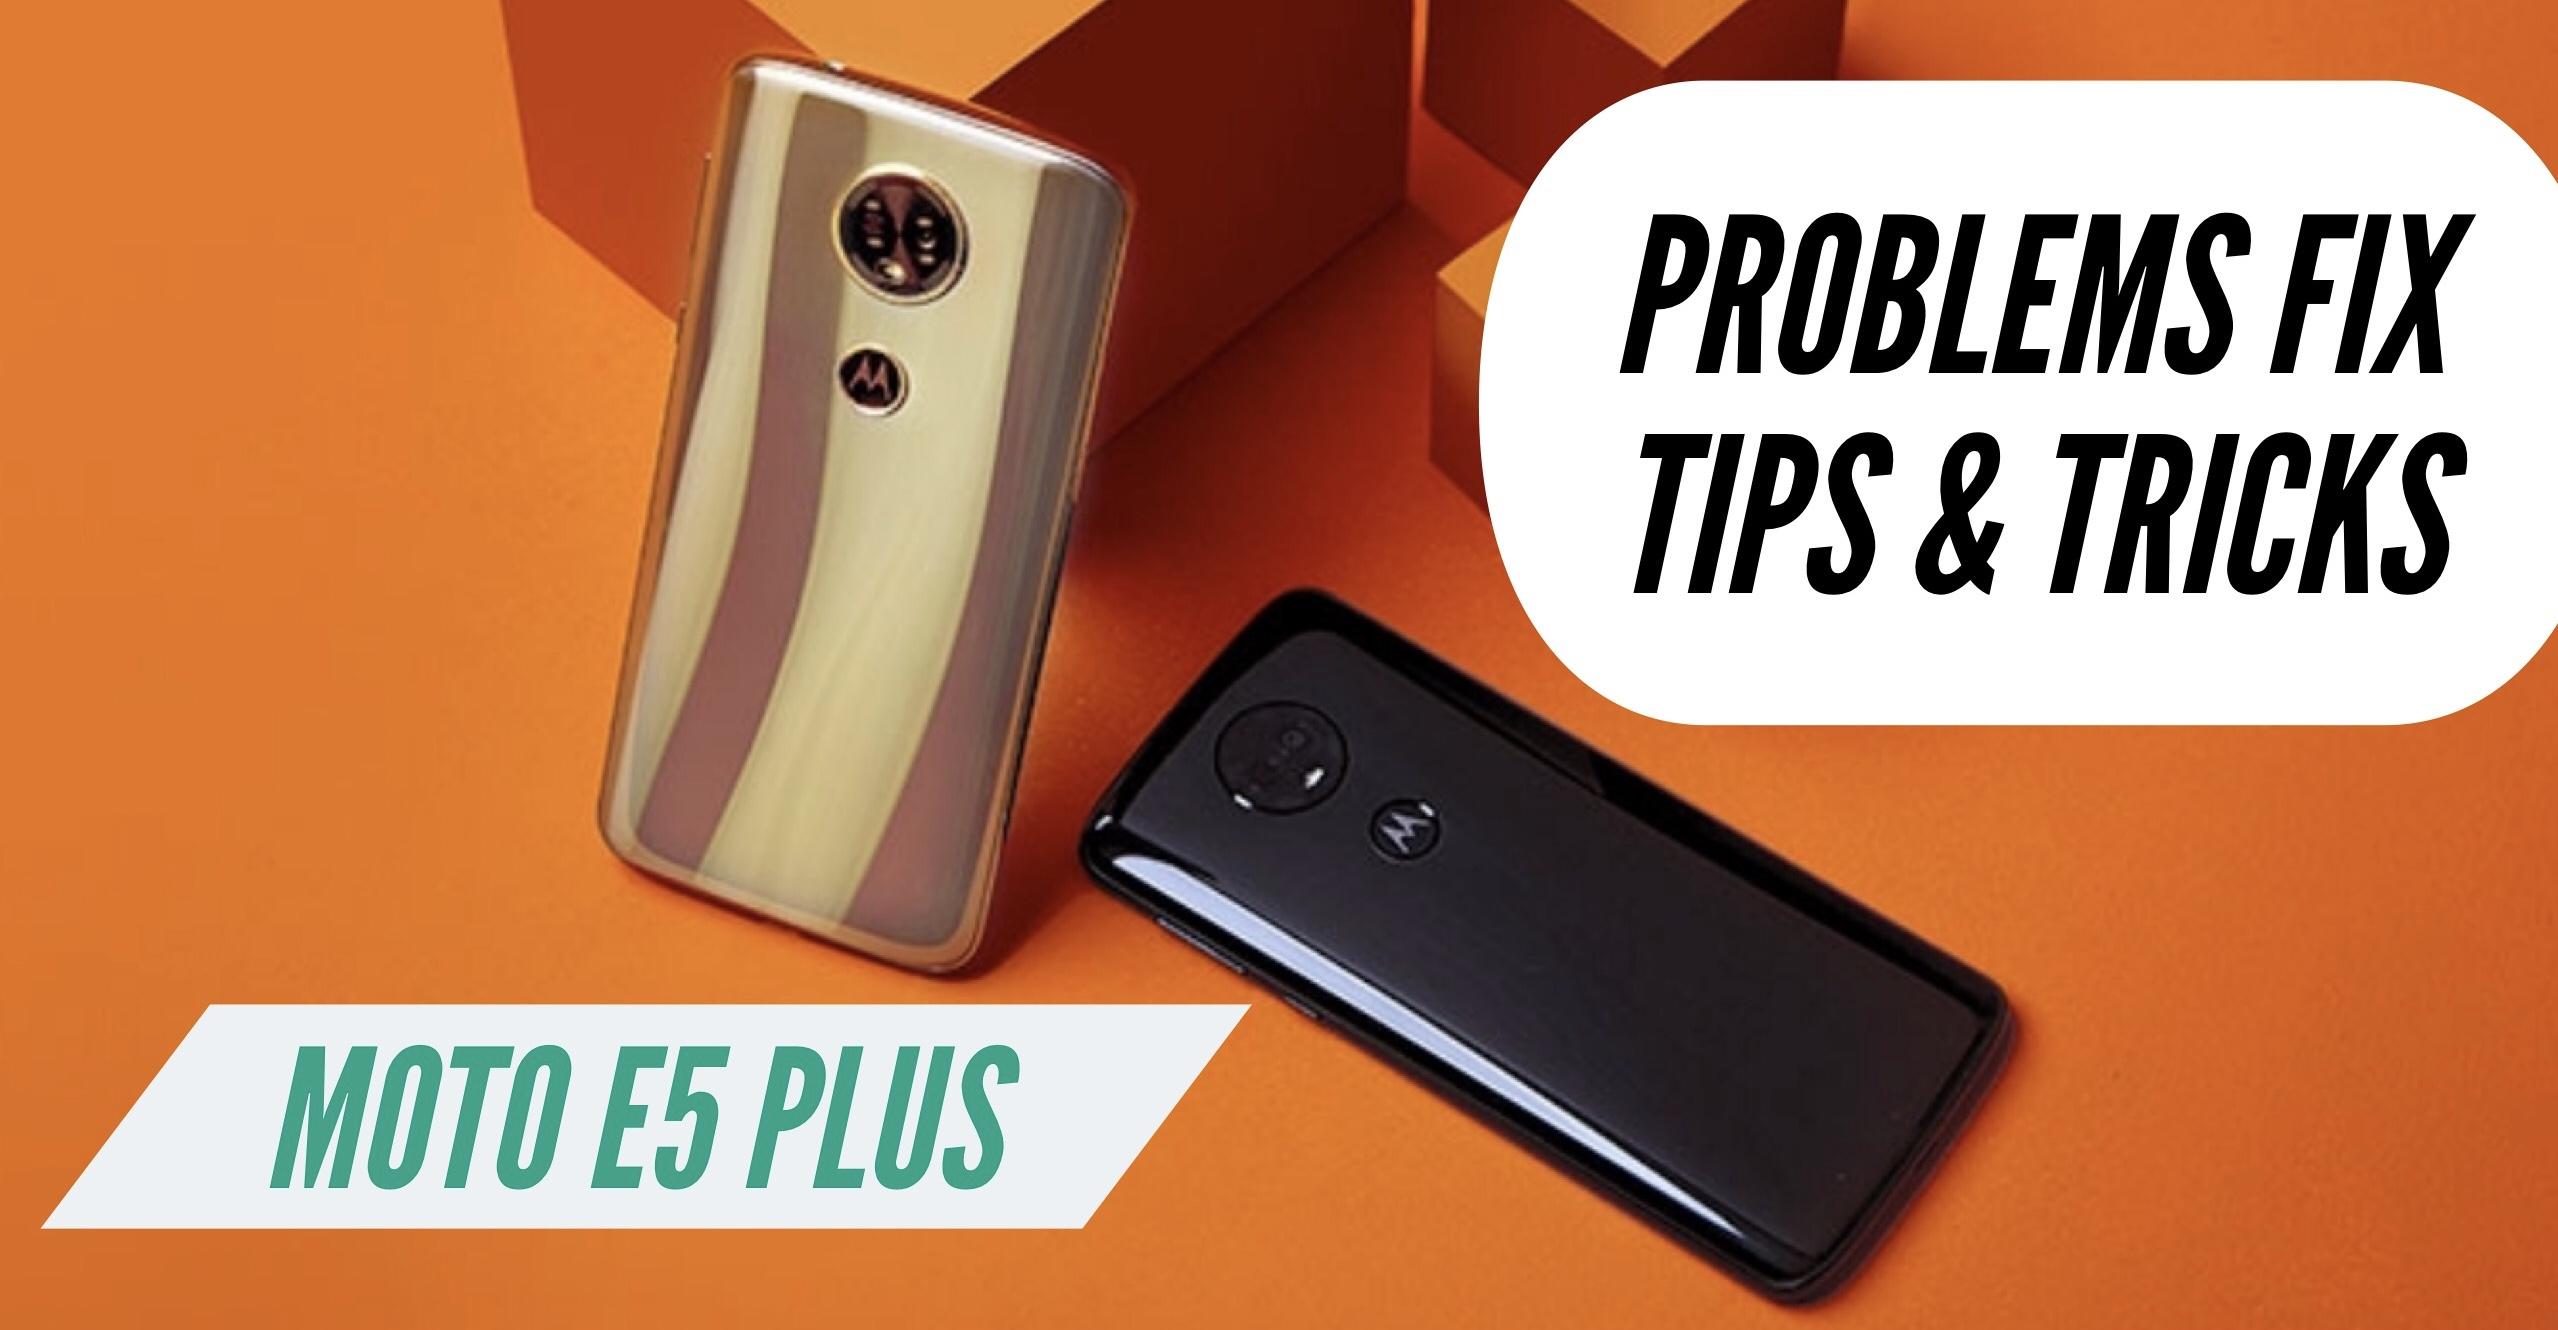 Moto E5 Plus Most Common Problems + Solution Fix: TIPS & TRICKS!